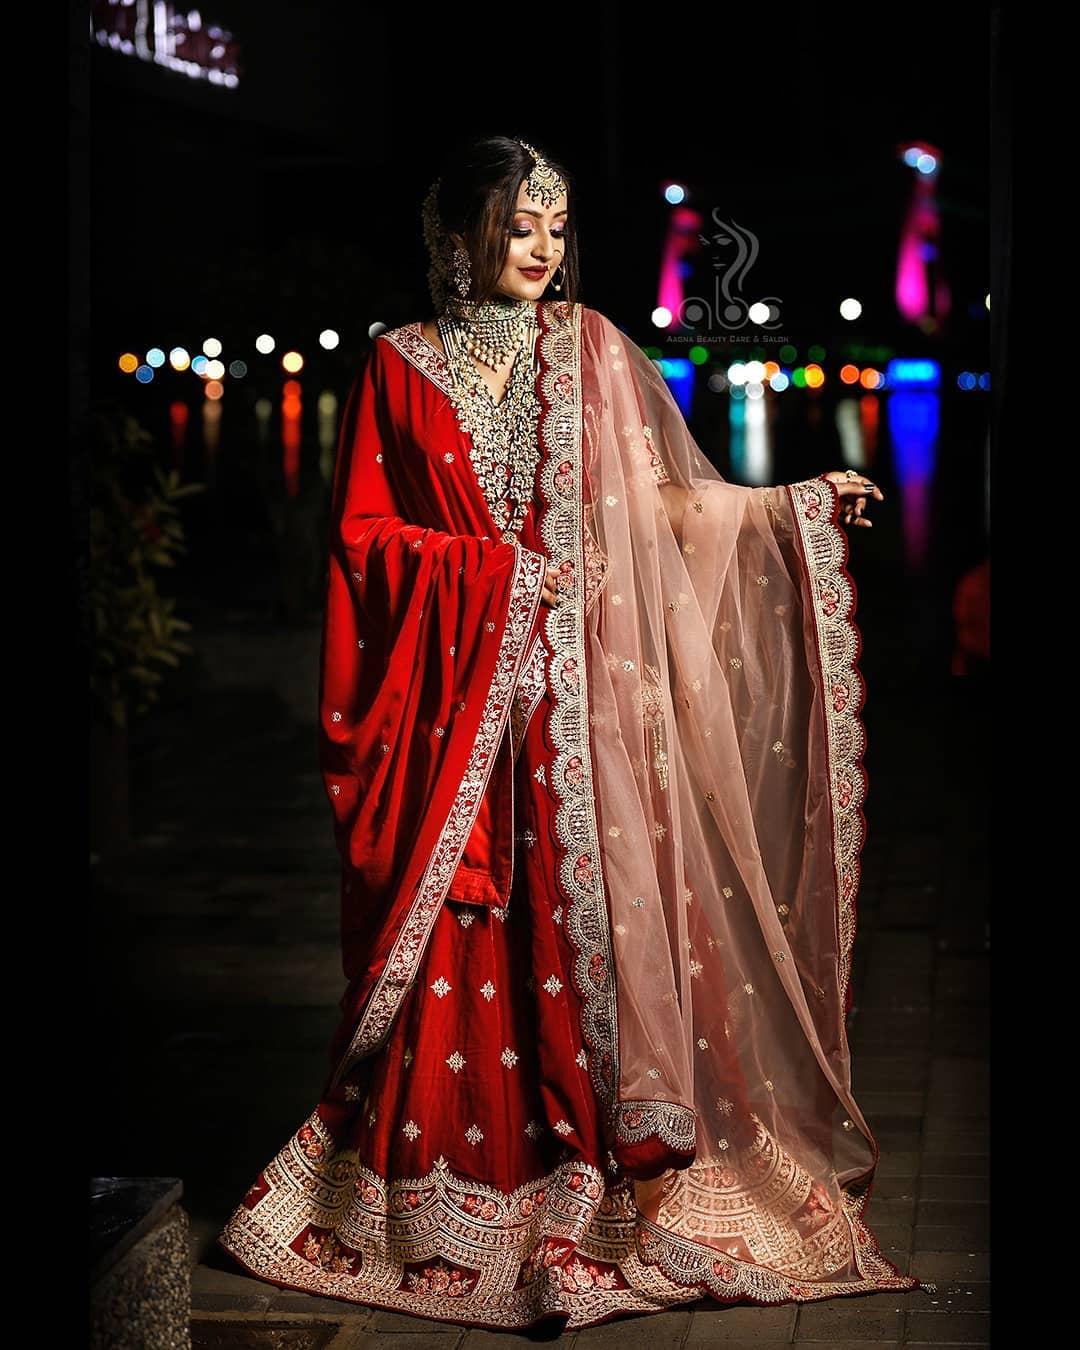 Dip Memento Photography,  beautiful#bride, dipmementophotography, beauty#9924227745#bridestyle#bridestory#wedding#weddingphotography#weddingdress#weddinginspiration#weddingideas#weddingphotographer#weddingdiaries#weddingbrigade#indianwedding#photography